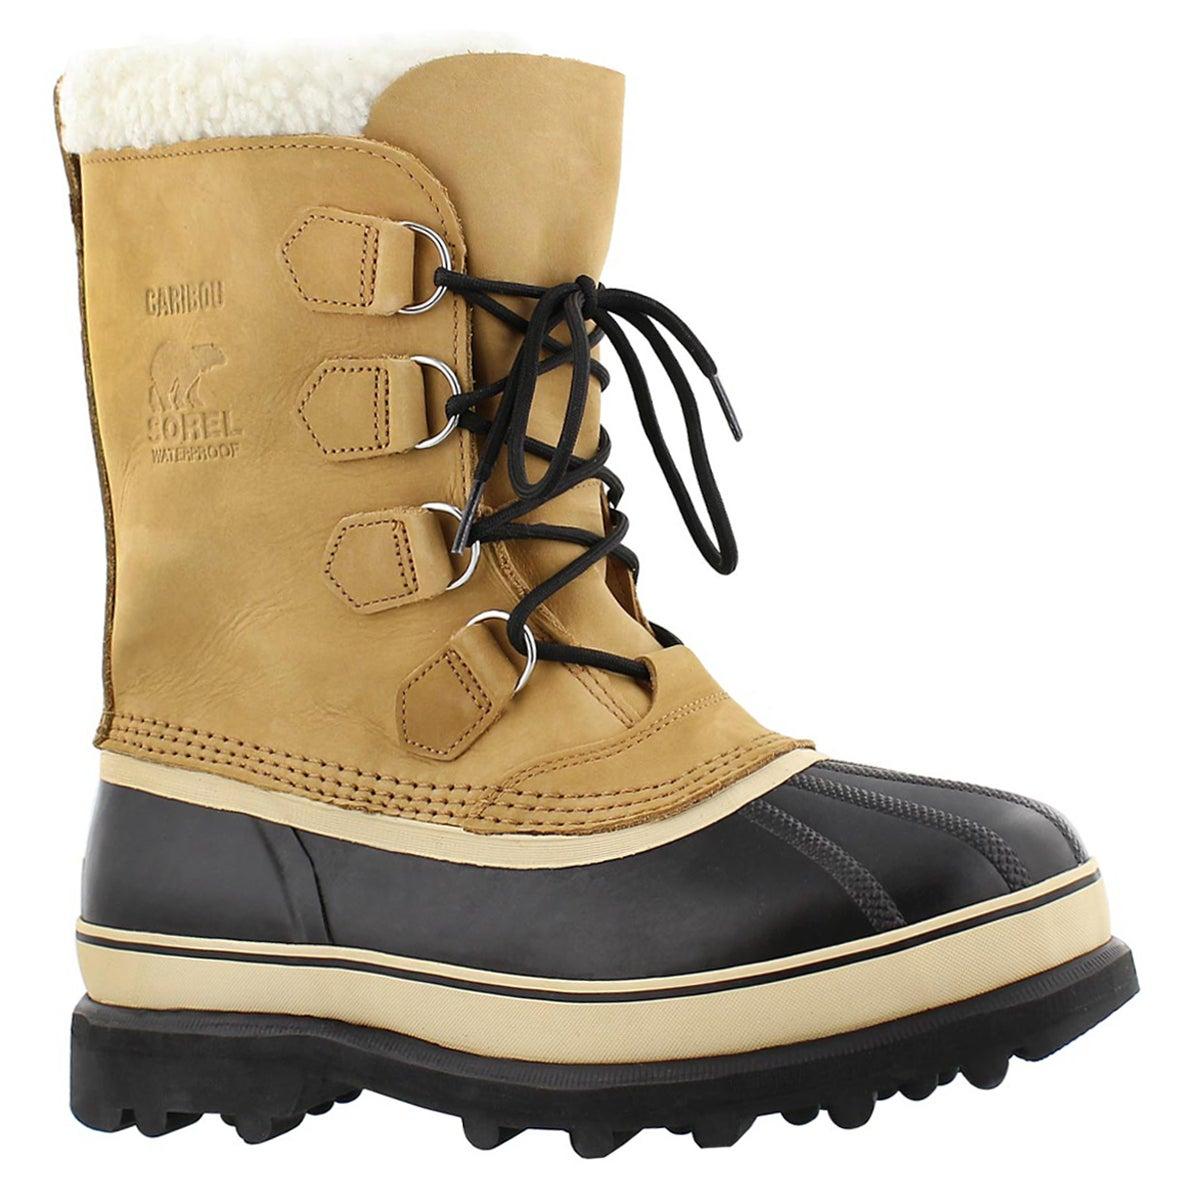 Mns Caribou buff nubuck pack boot